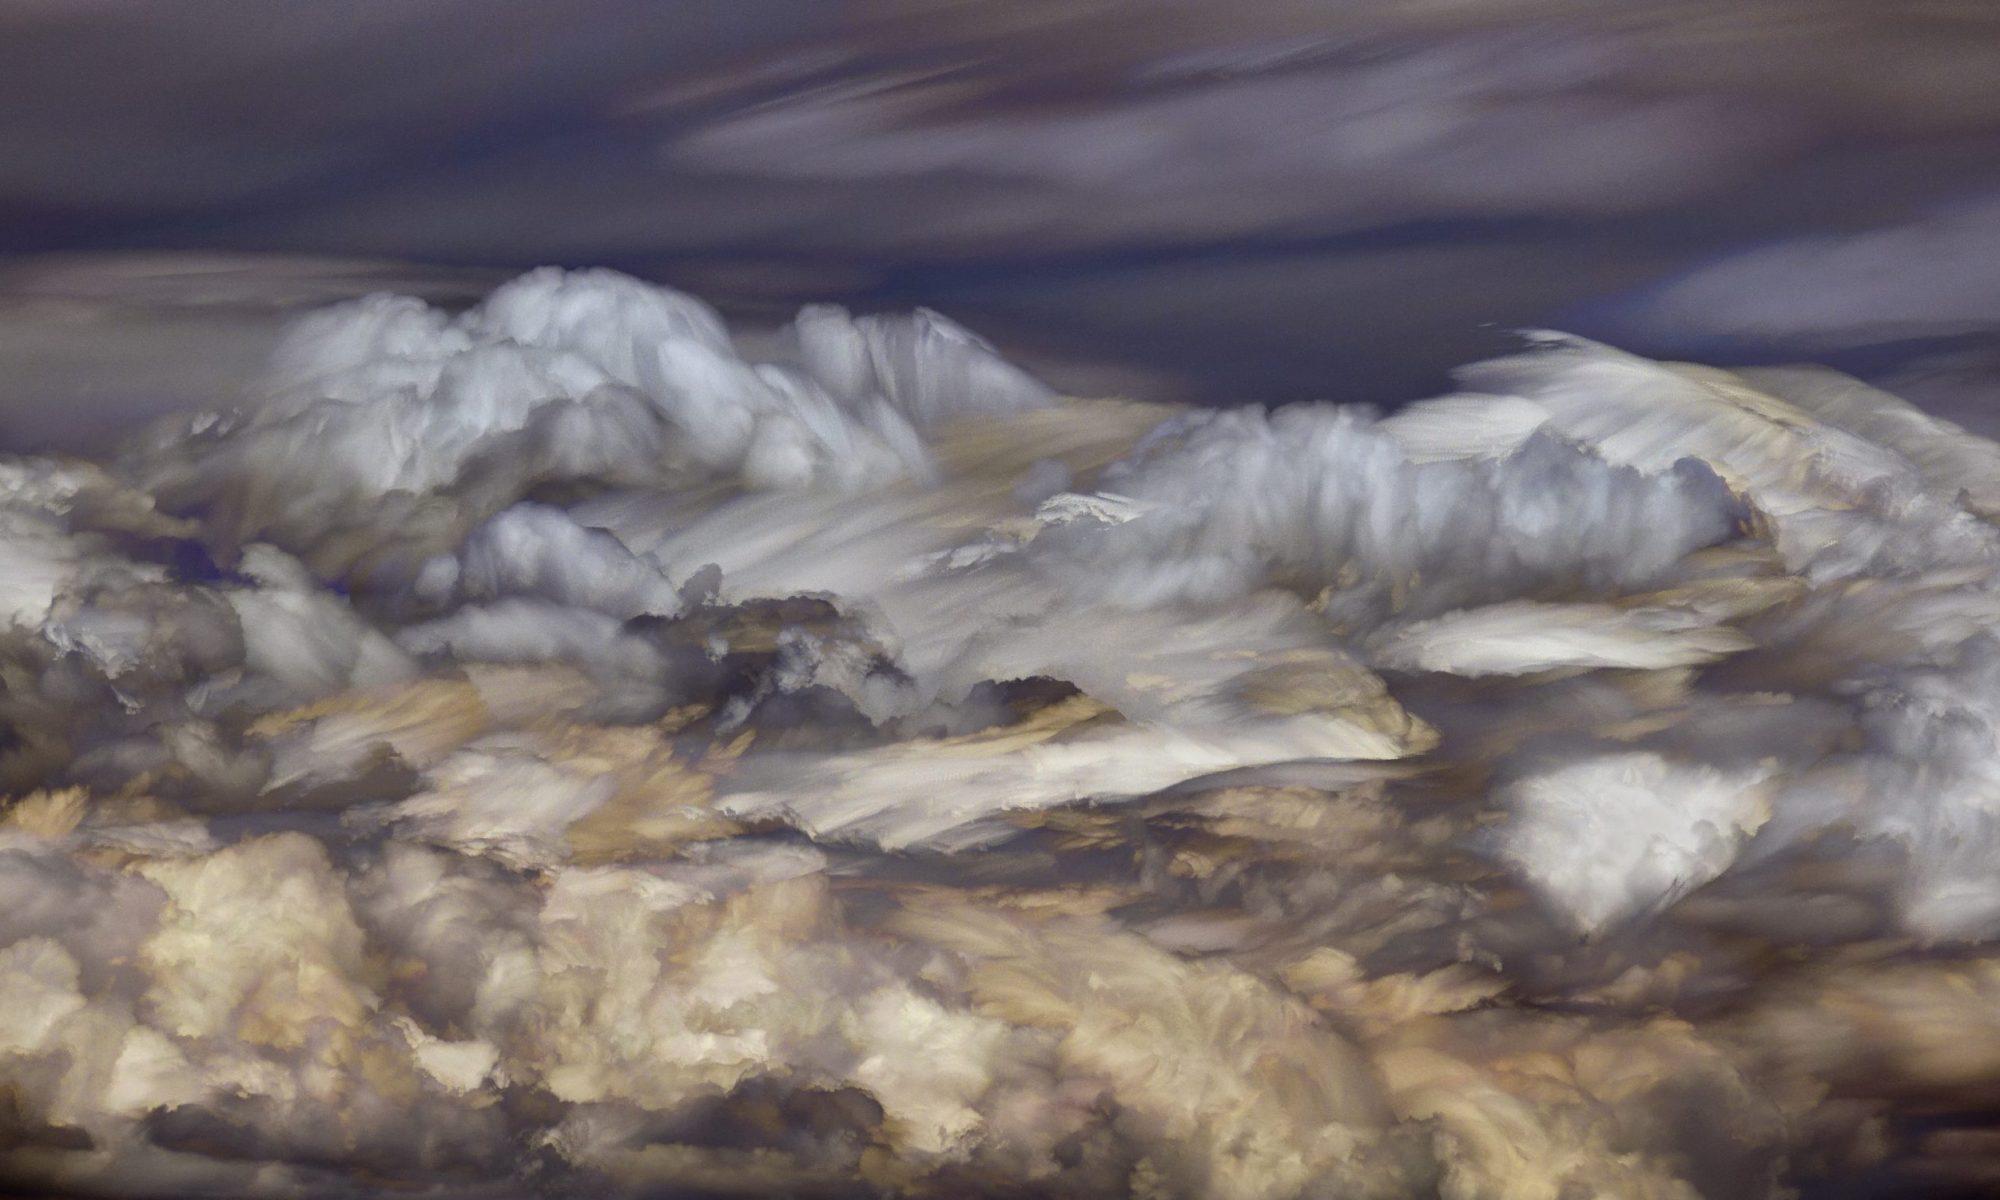 Massive storm - photo by John Fowler - Unsplash